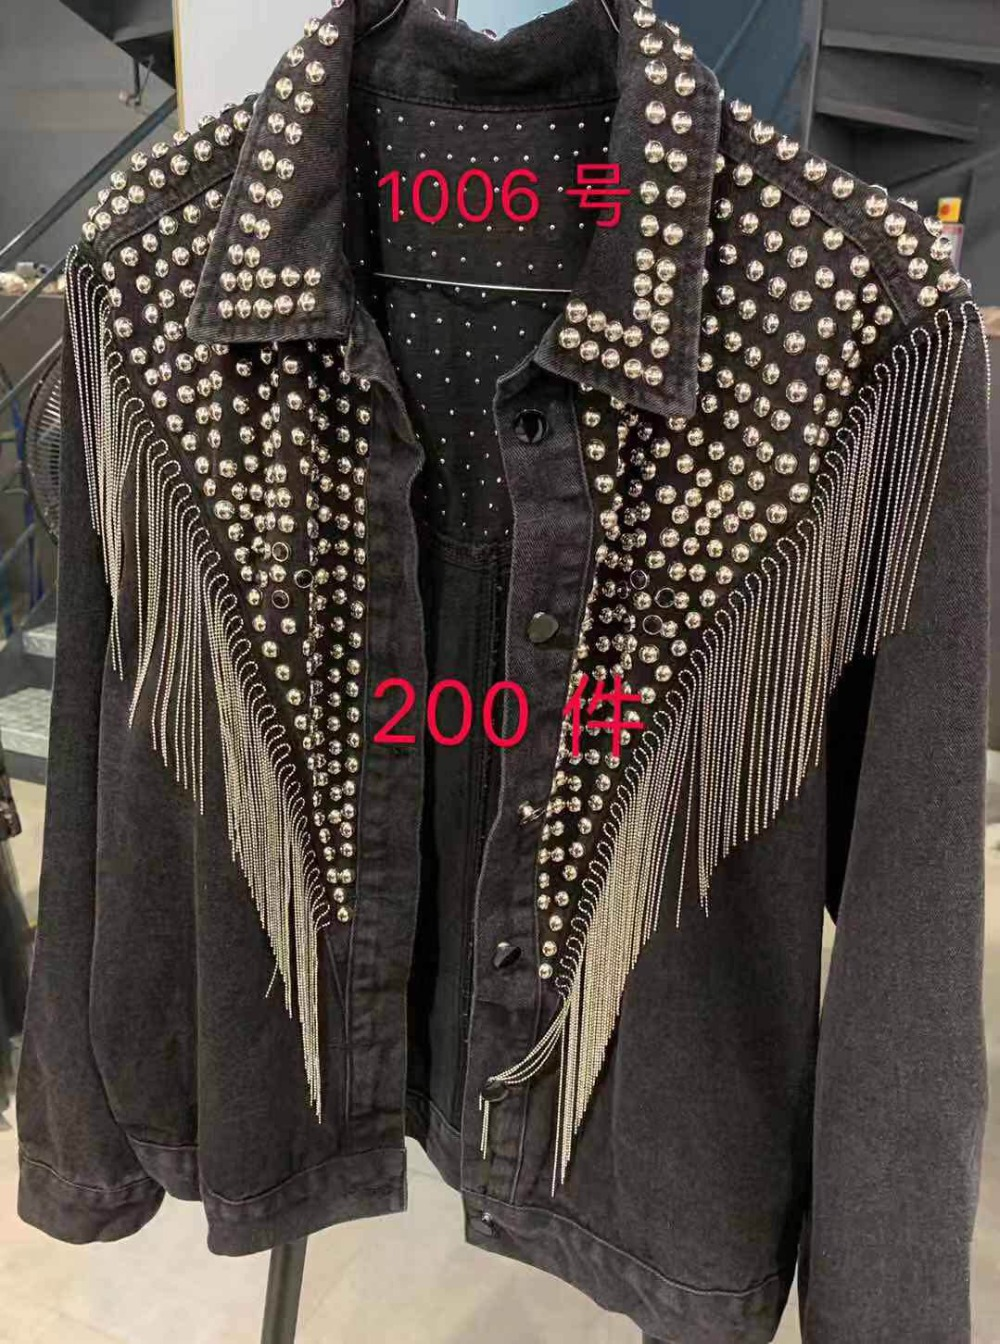 Uf78f715f94074c5d8cba3255cf1fd90b8 denim  jacket  women  xintiandi sherpa  streetwear  trending products 2019 womens jackets and coats